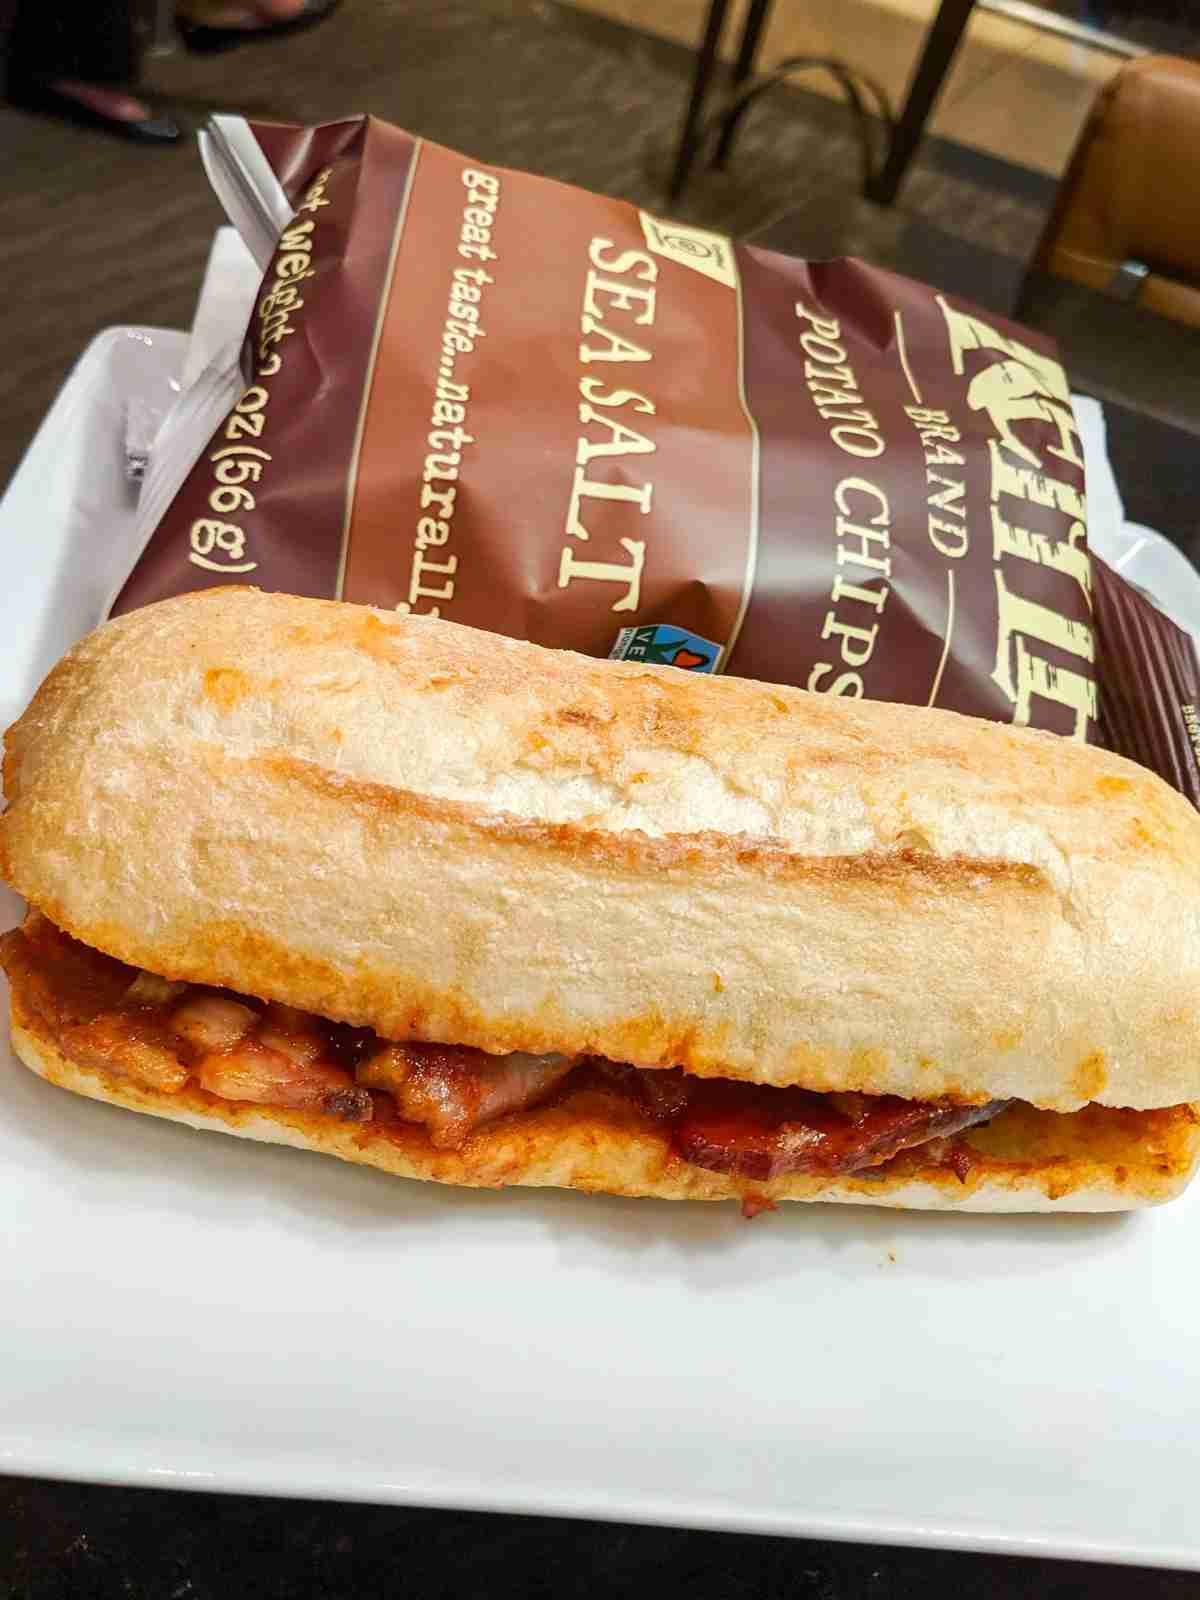 The new brisket sandwich at DFW. (Photo courtesy of Adam McGuire)